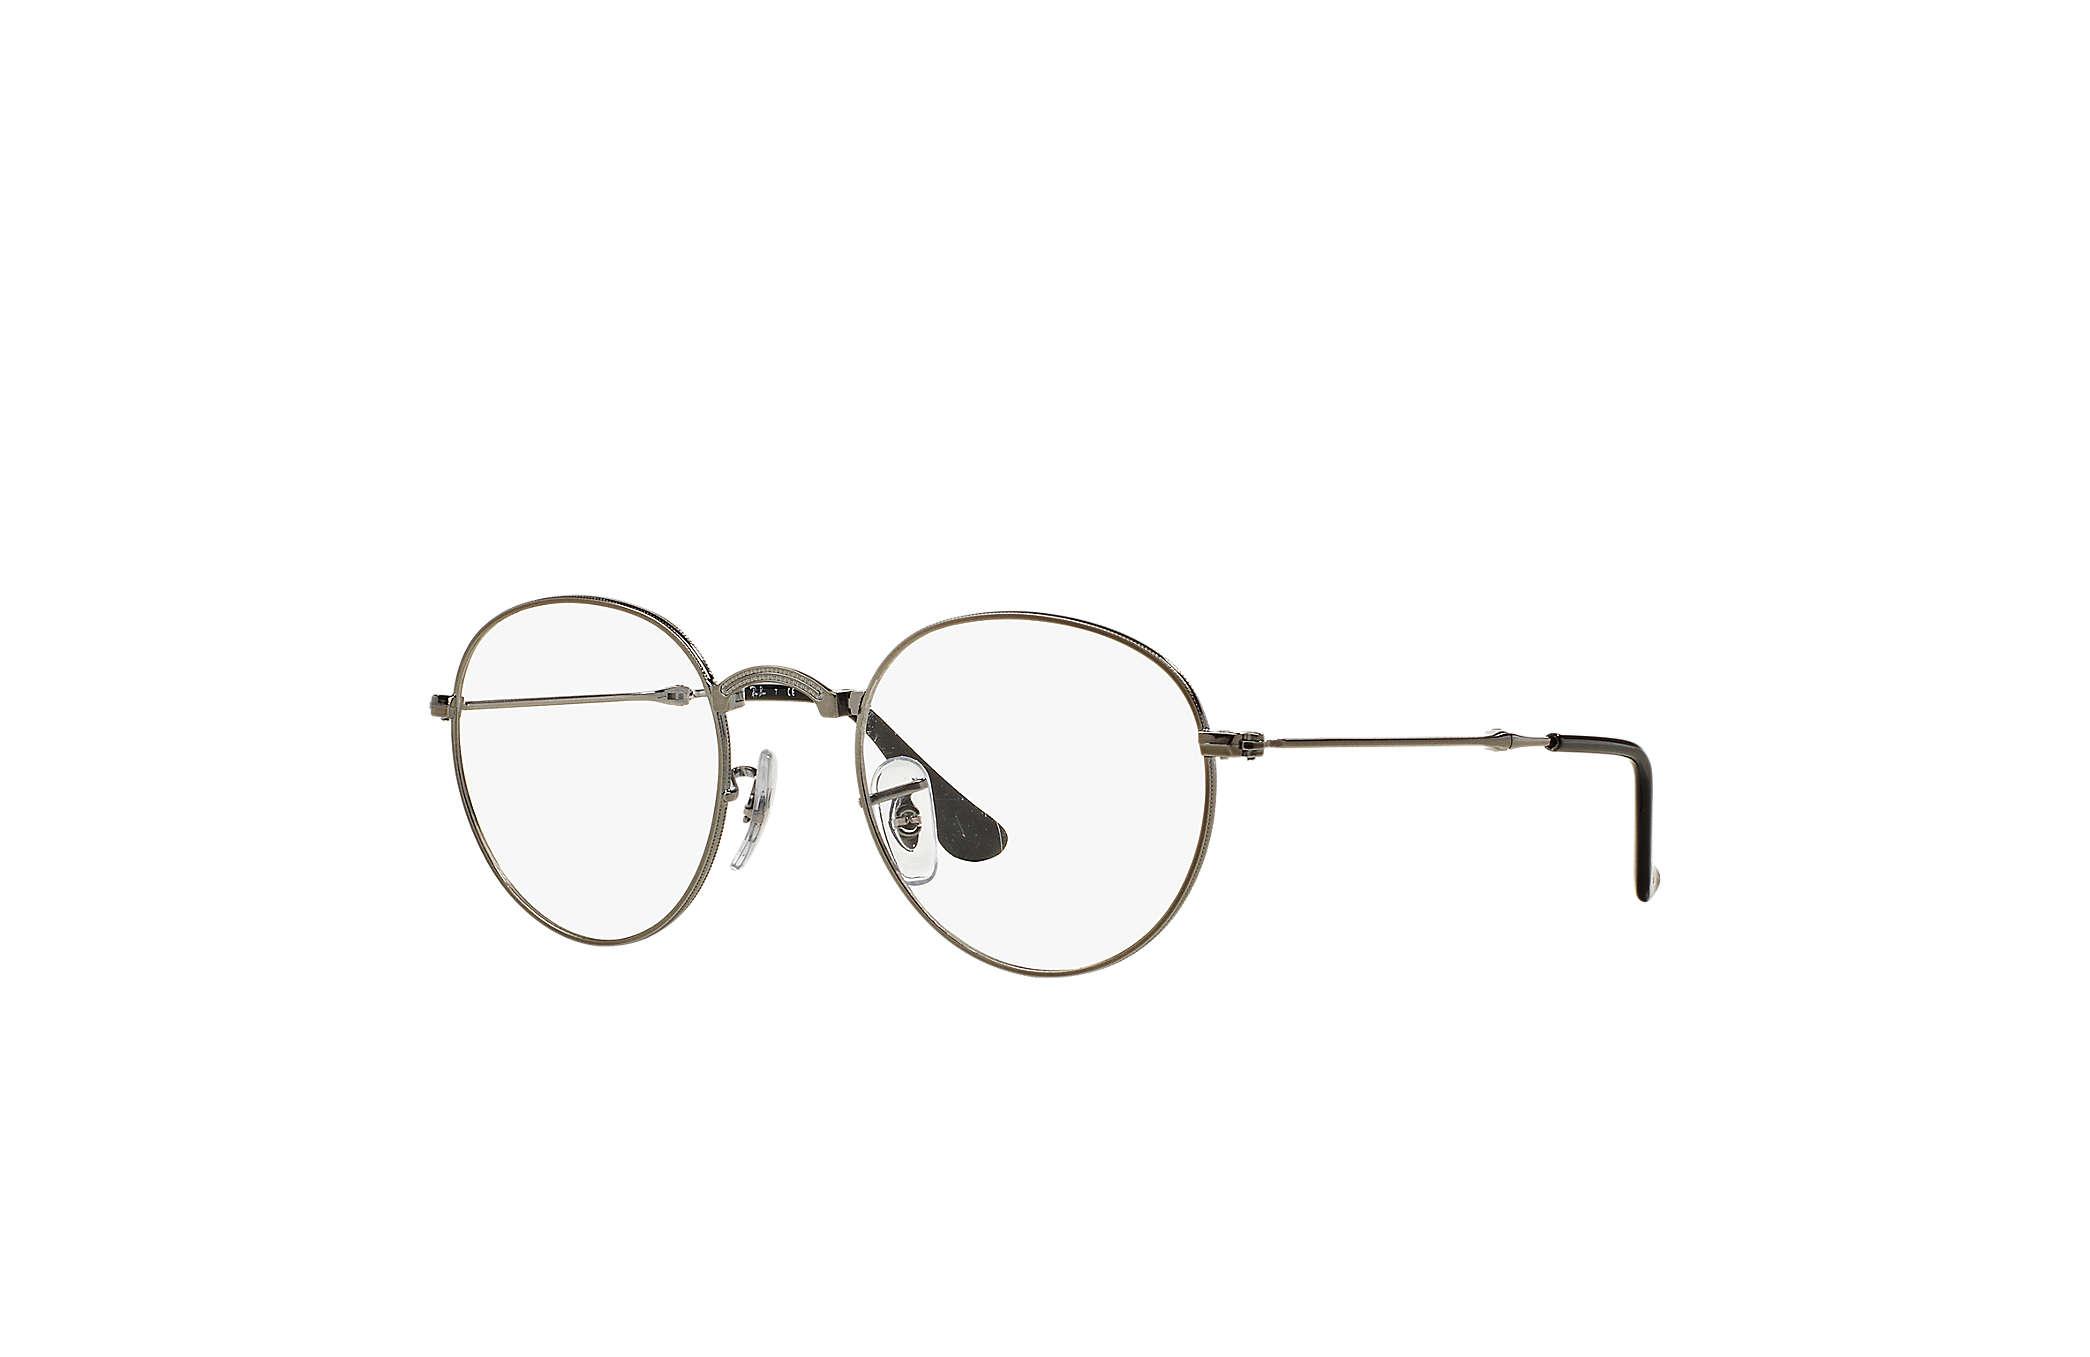 Occhiali da vista RX3532V Ray ban Occhiali da vista Ray